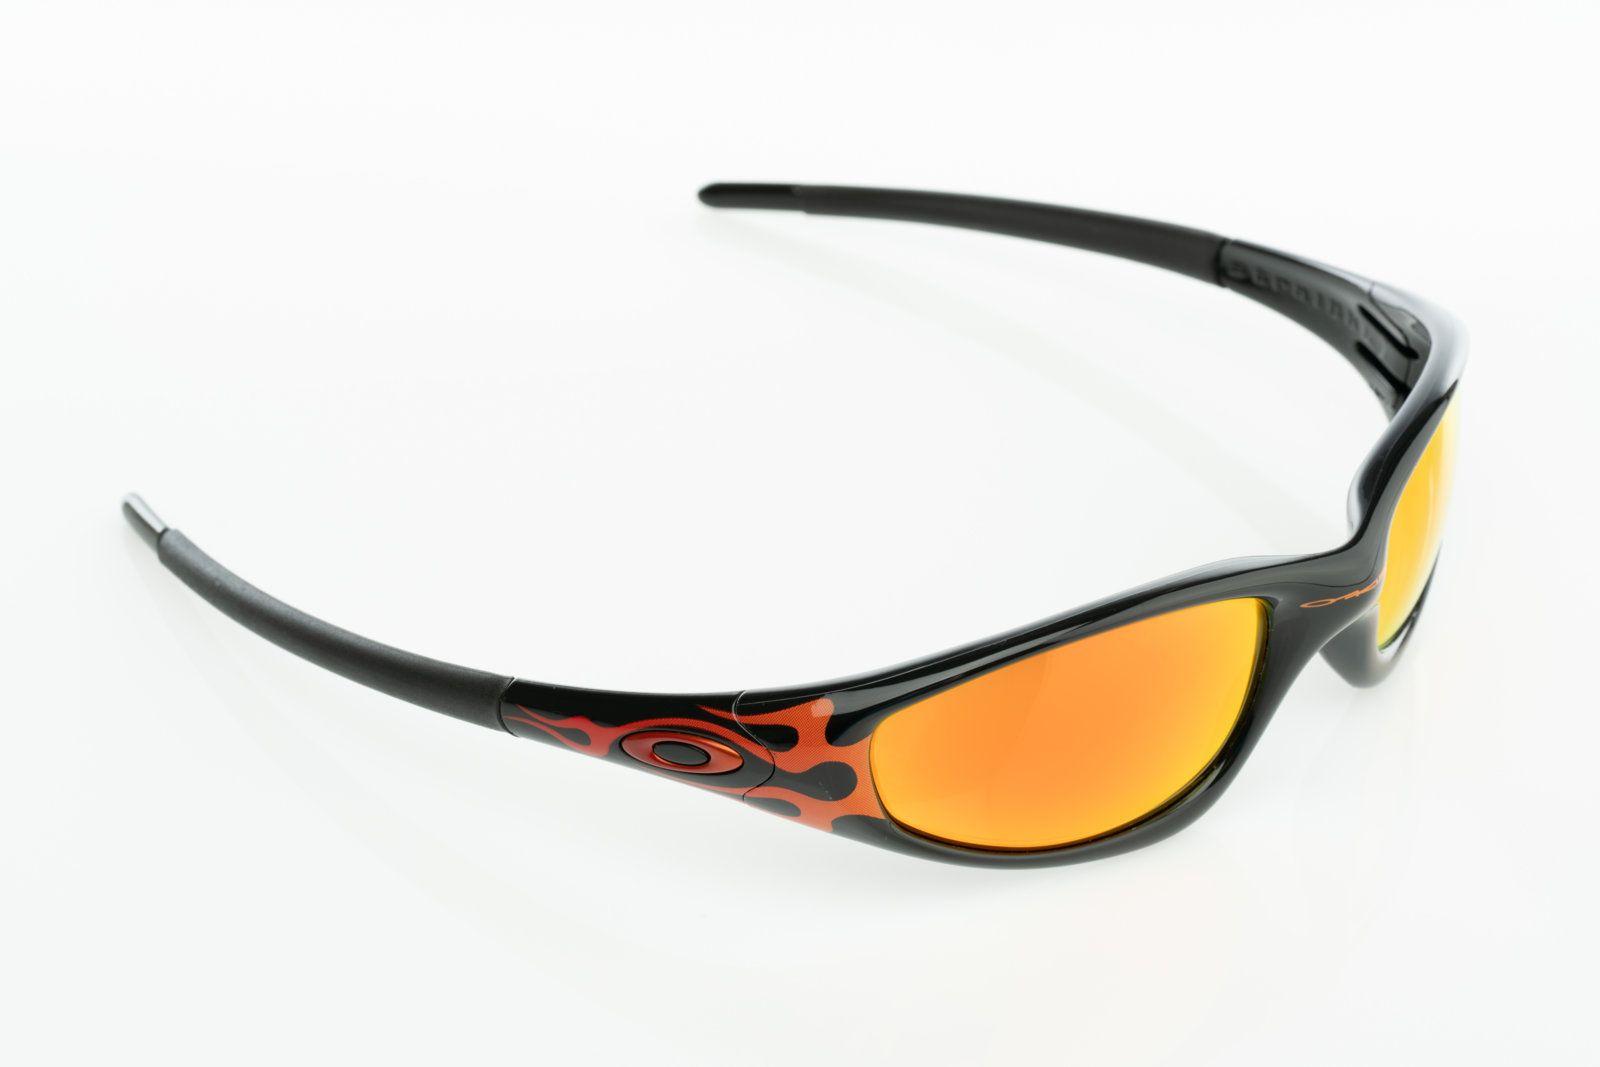 d54d5aa8740 Sold - NIB Oakley Straight Jacket